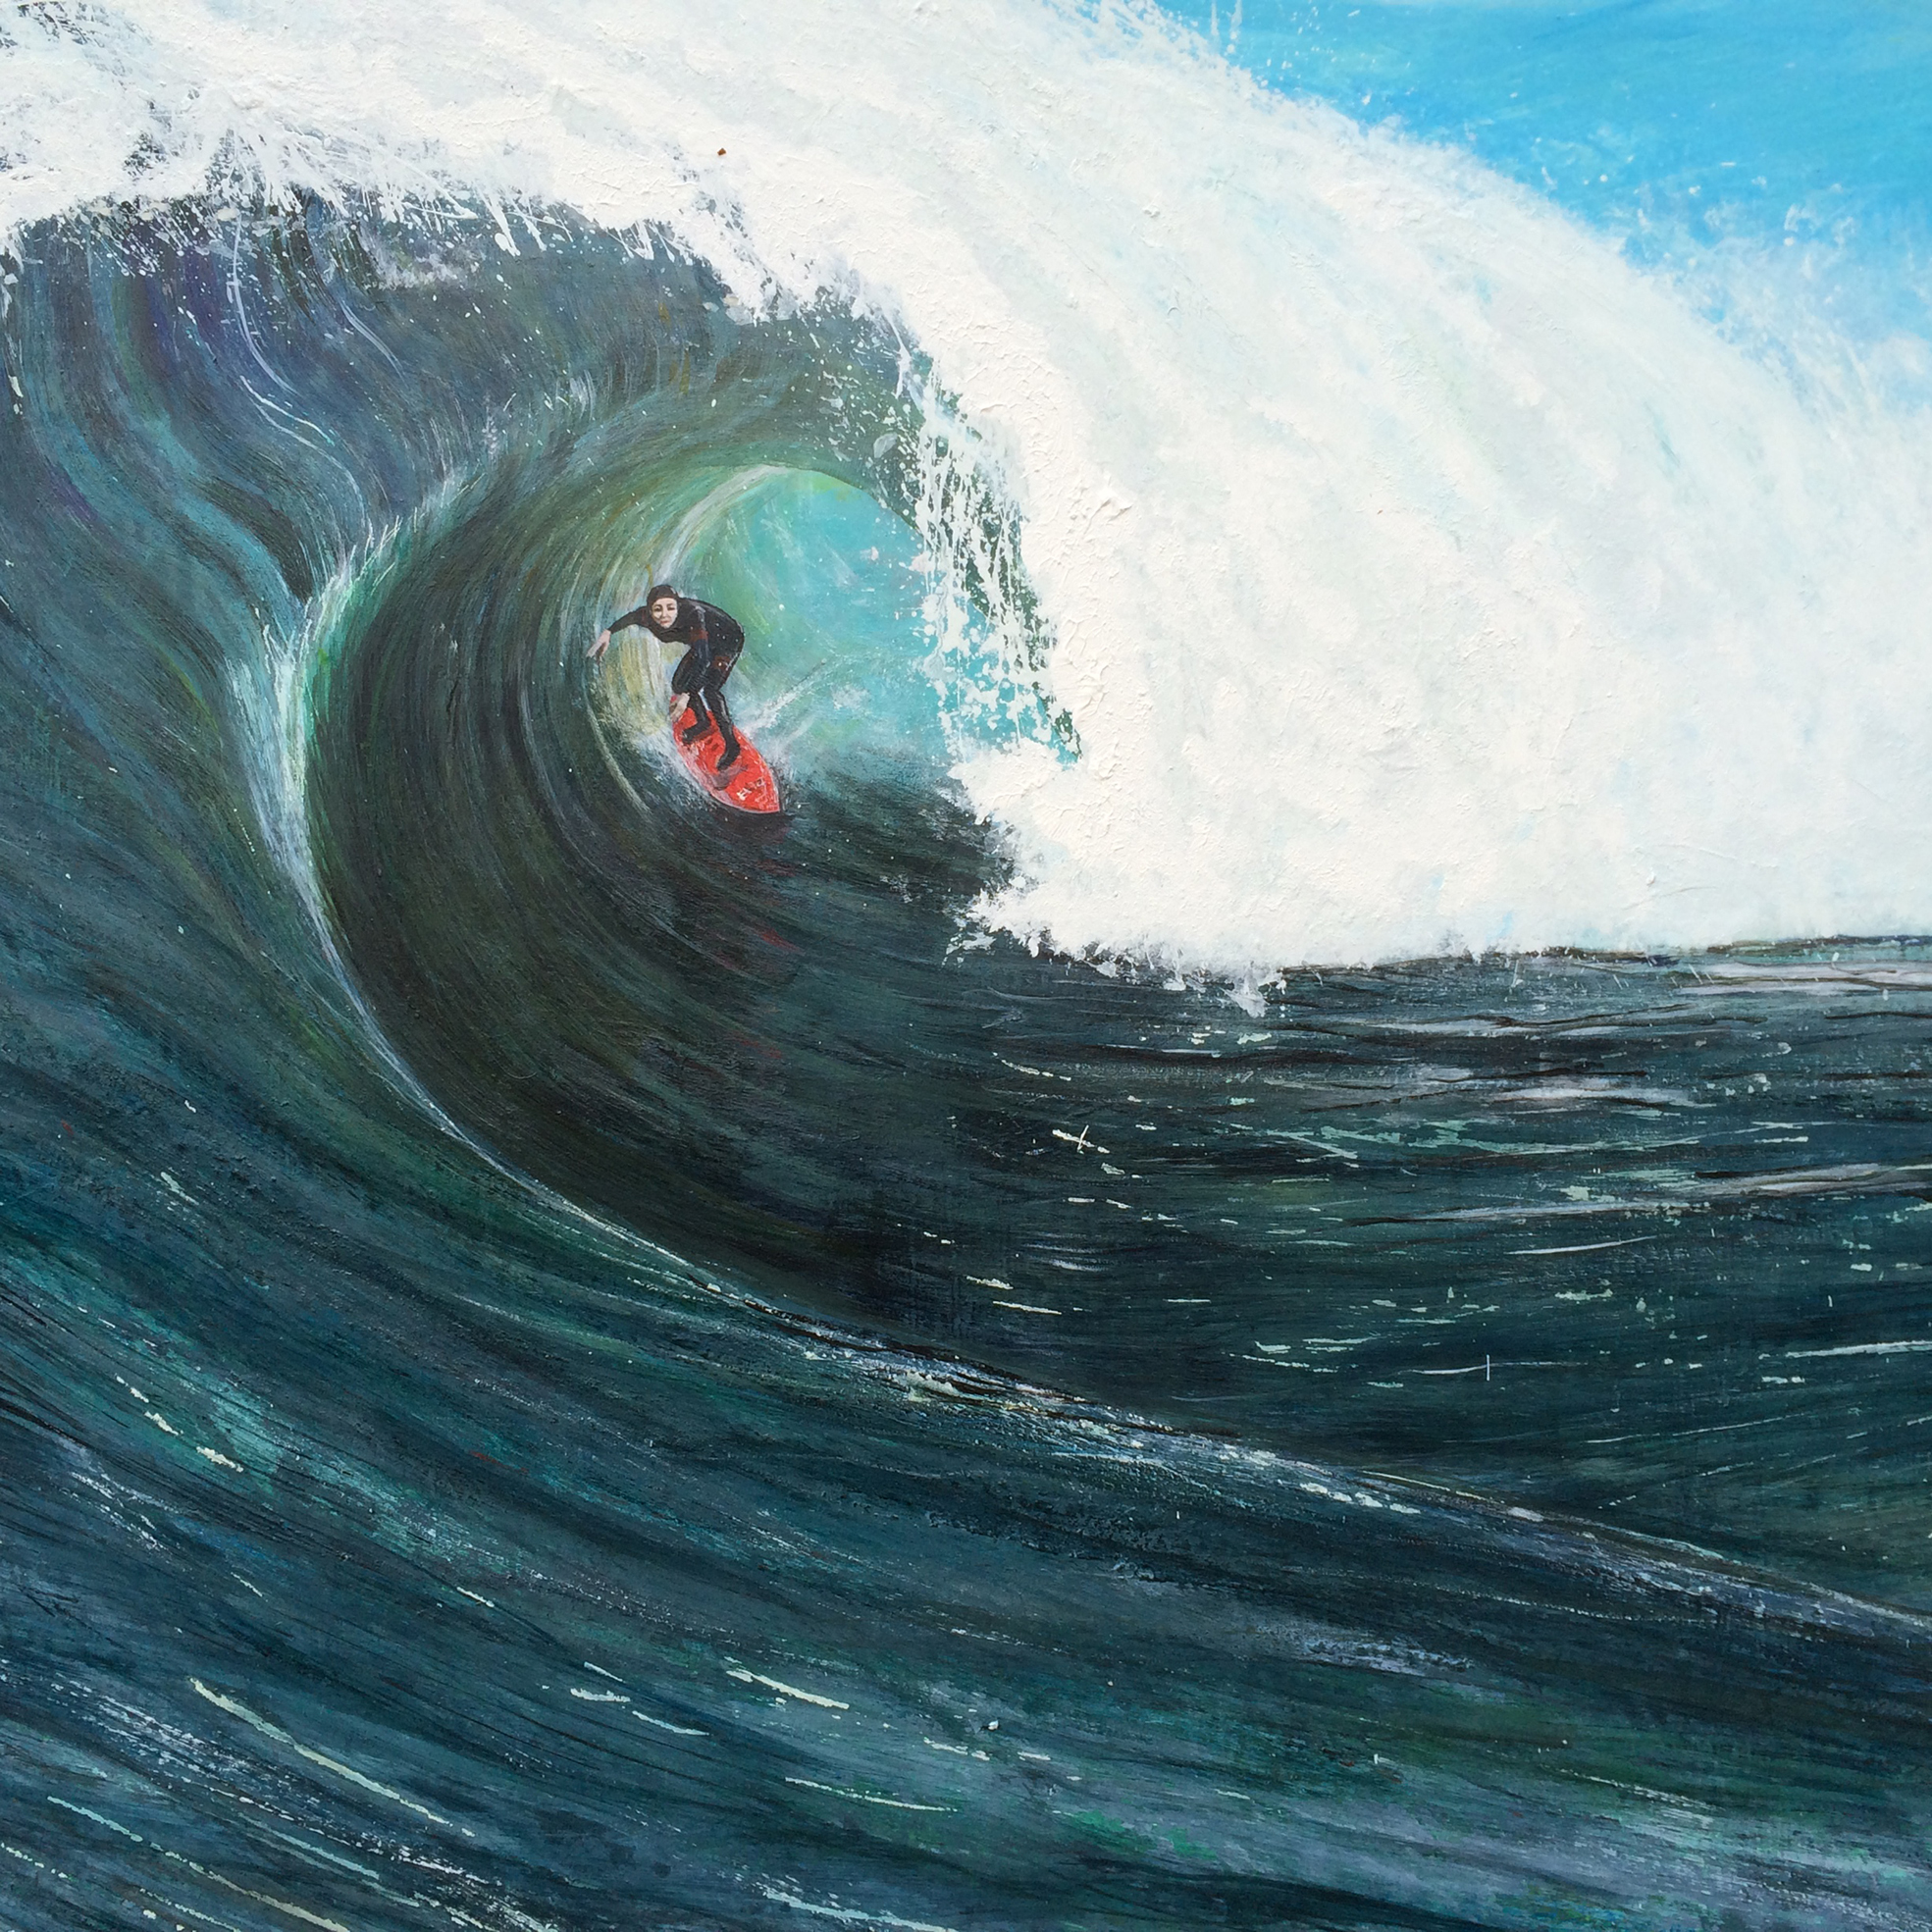 SurfHer